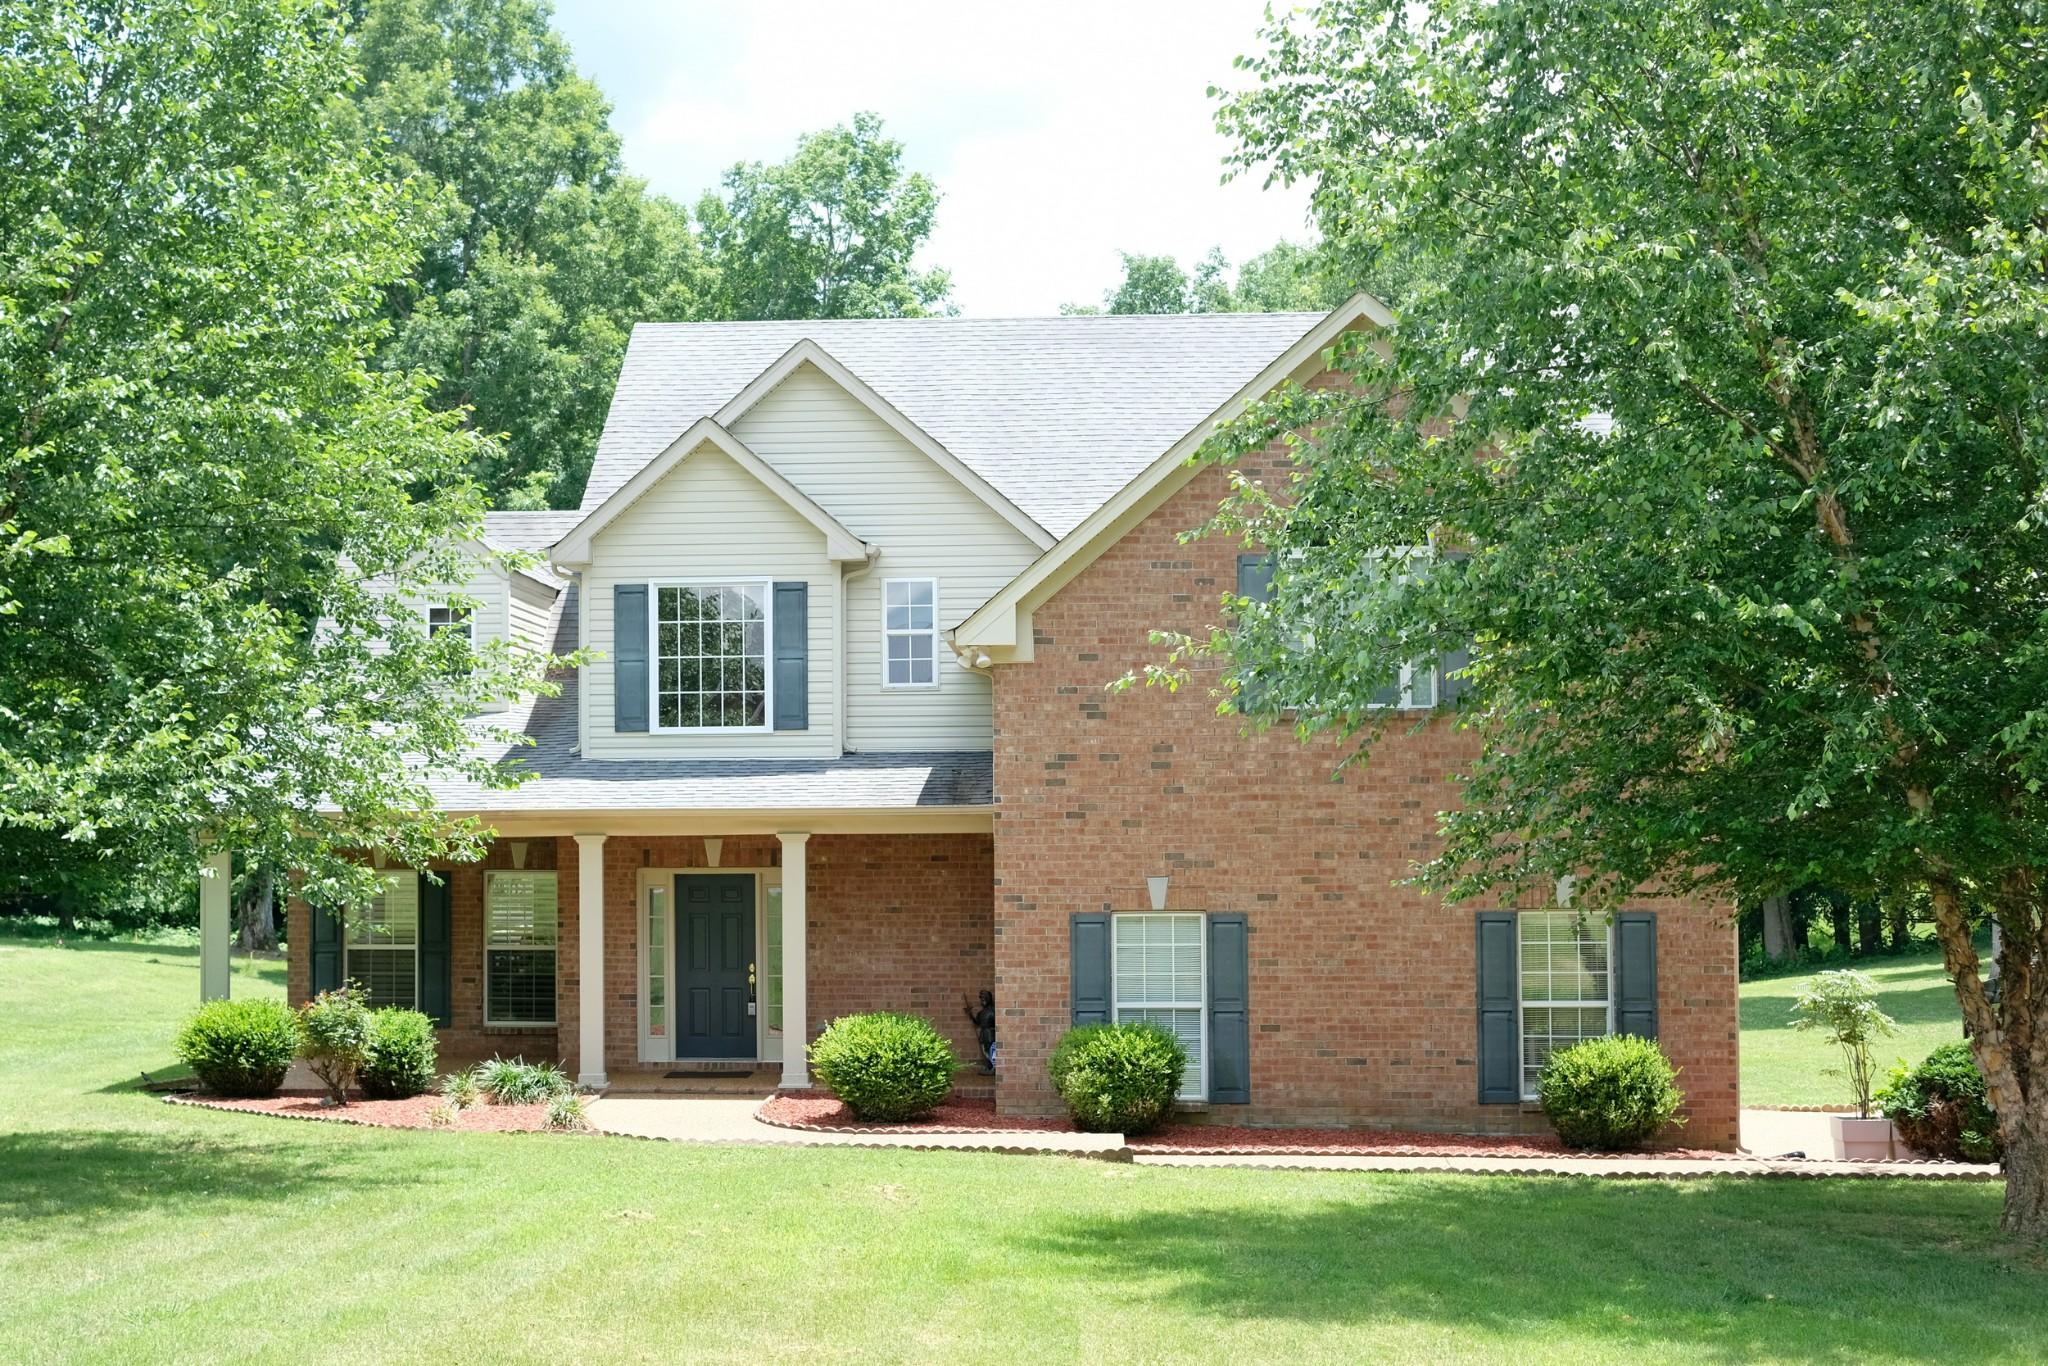 1013 Ridglea Dr Property Photo - Burns, TN real estate listing